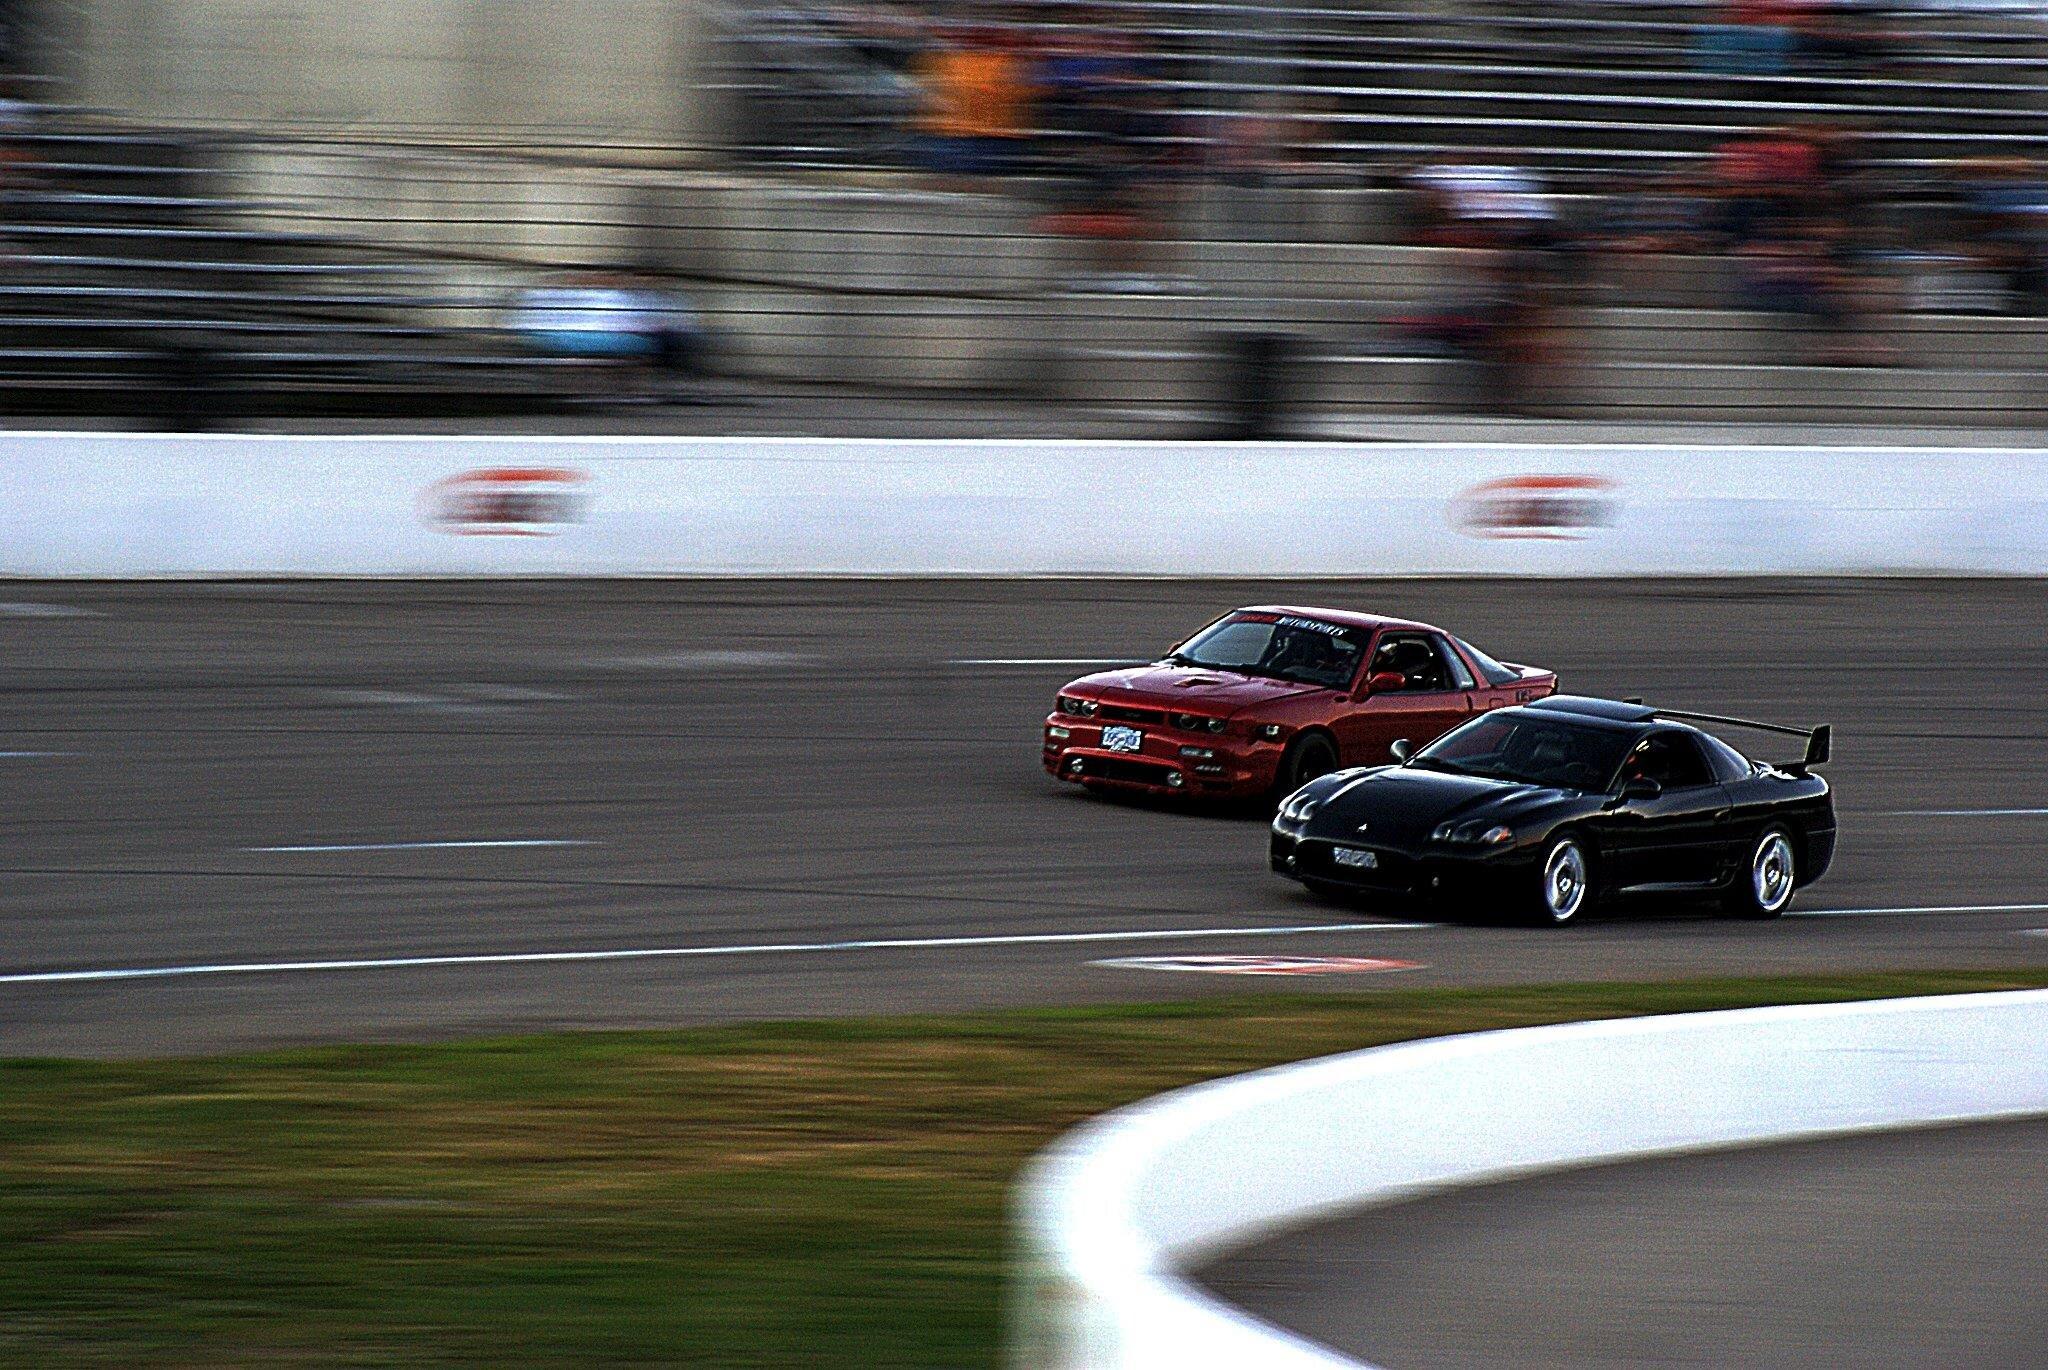 impulse racing.jpg